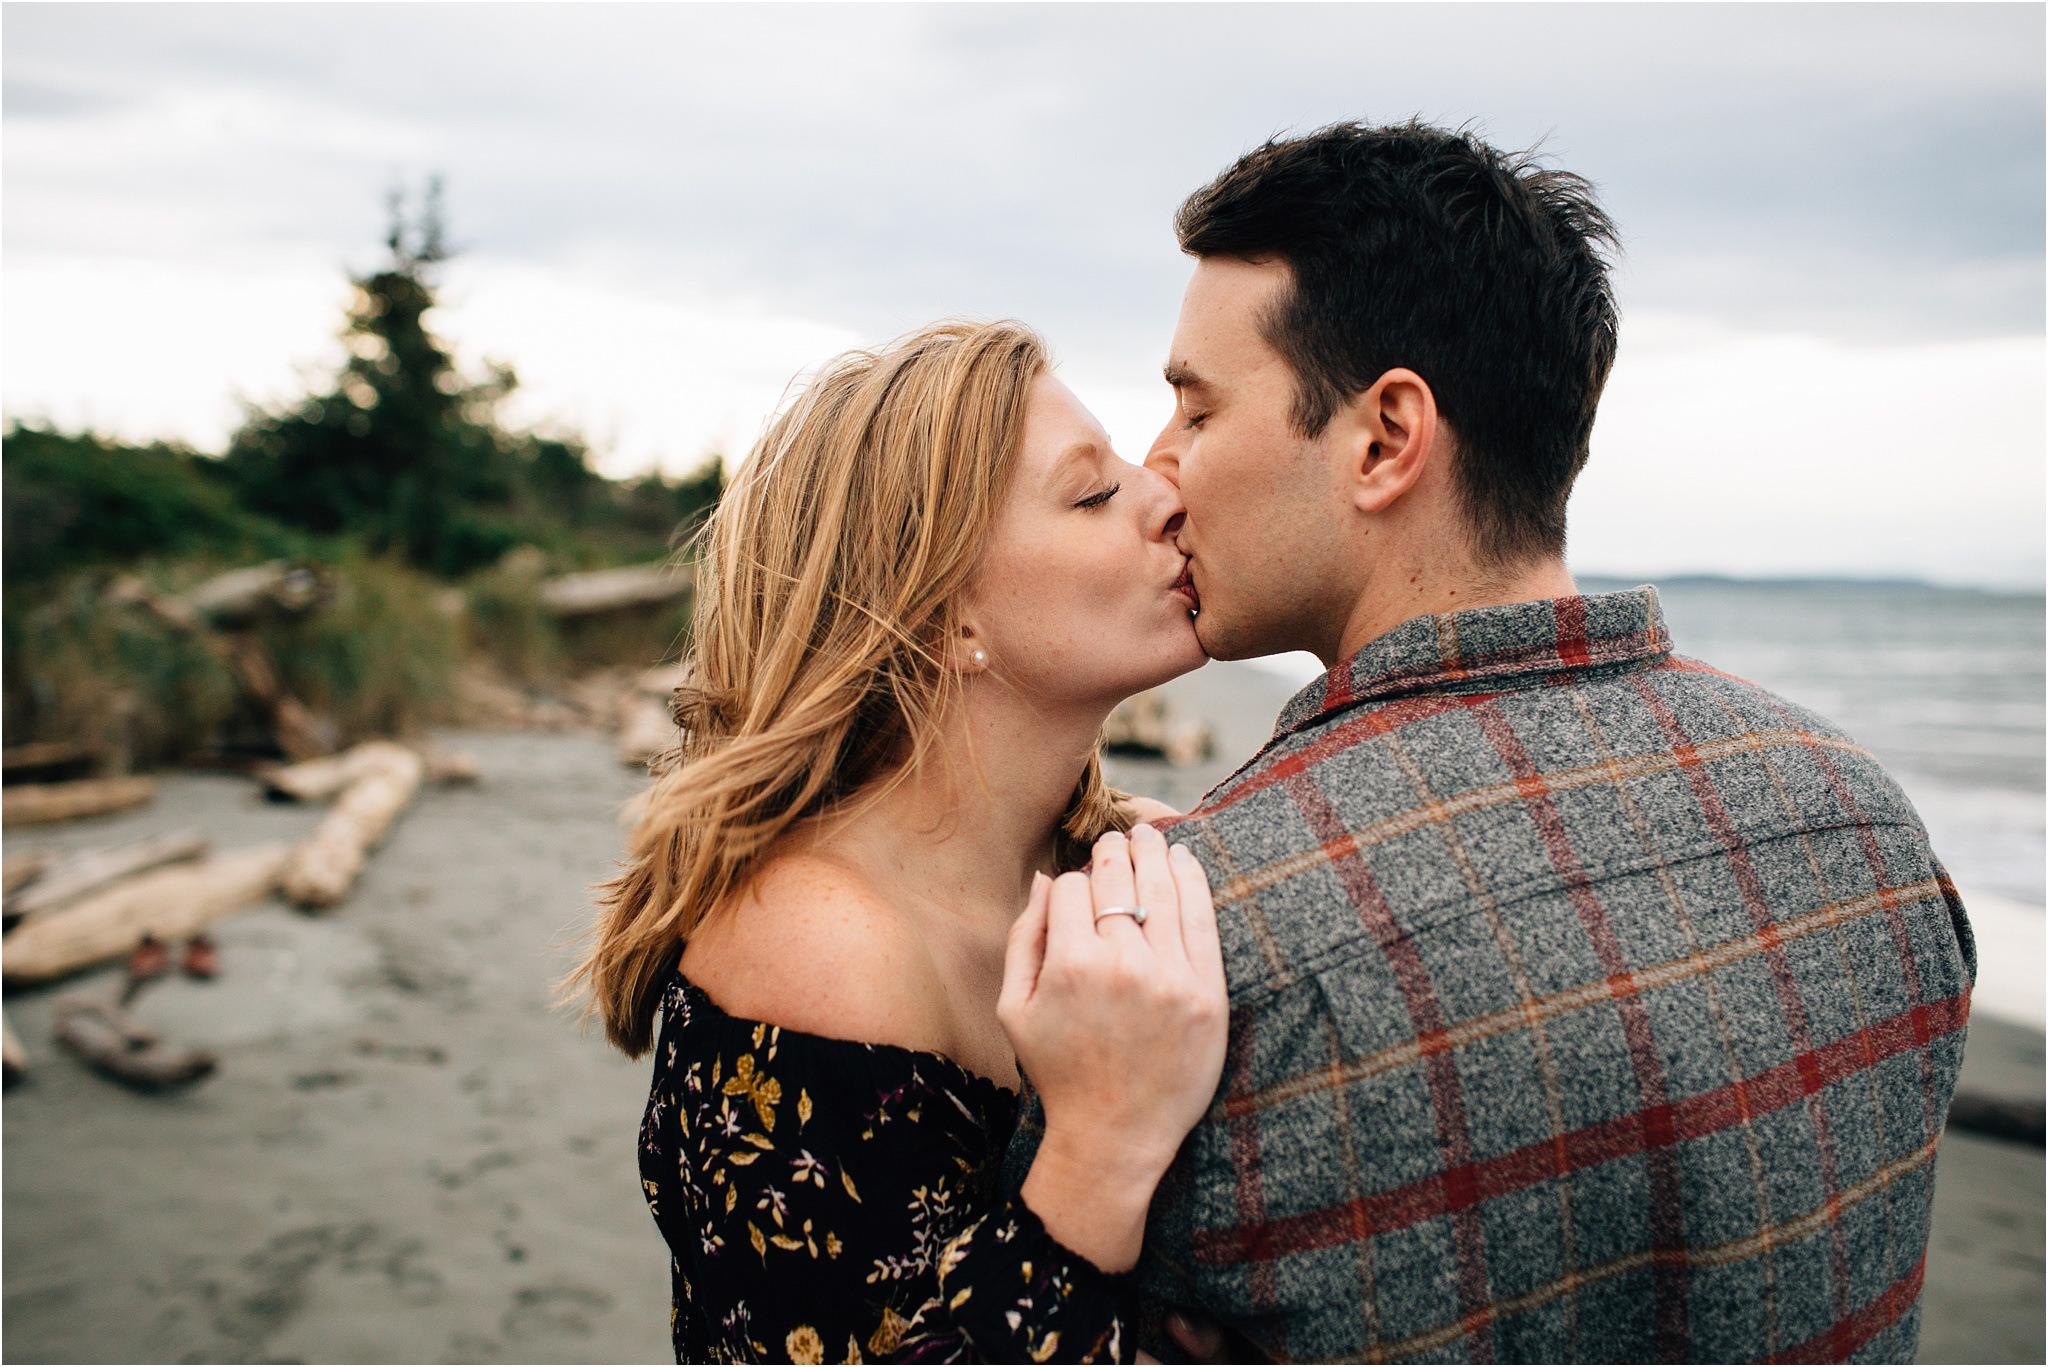 oak-harbor-couples-photographer-deception-pass-54.jpg